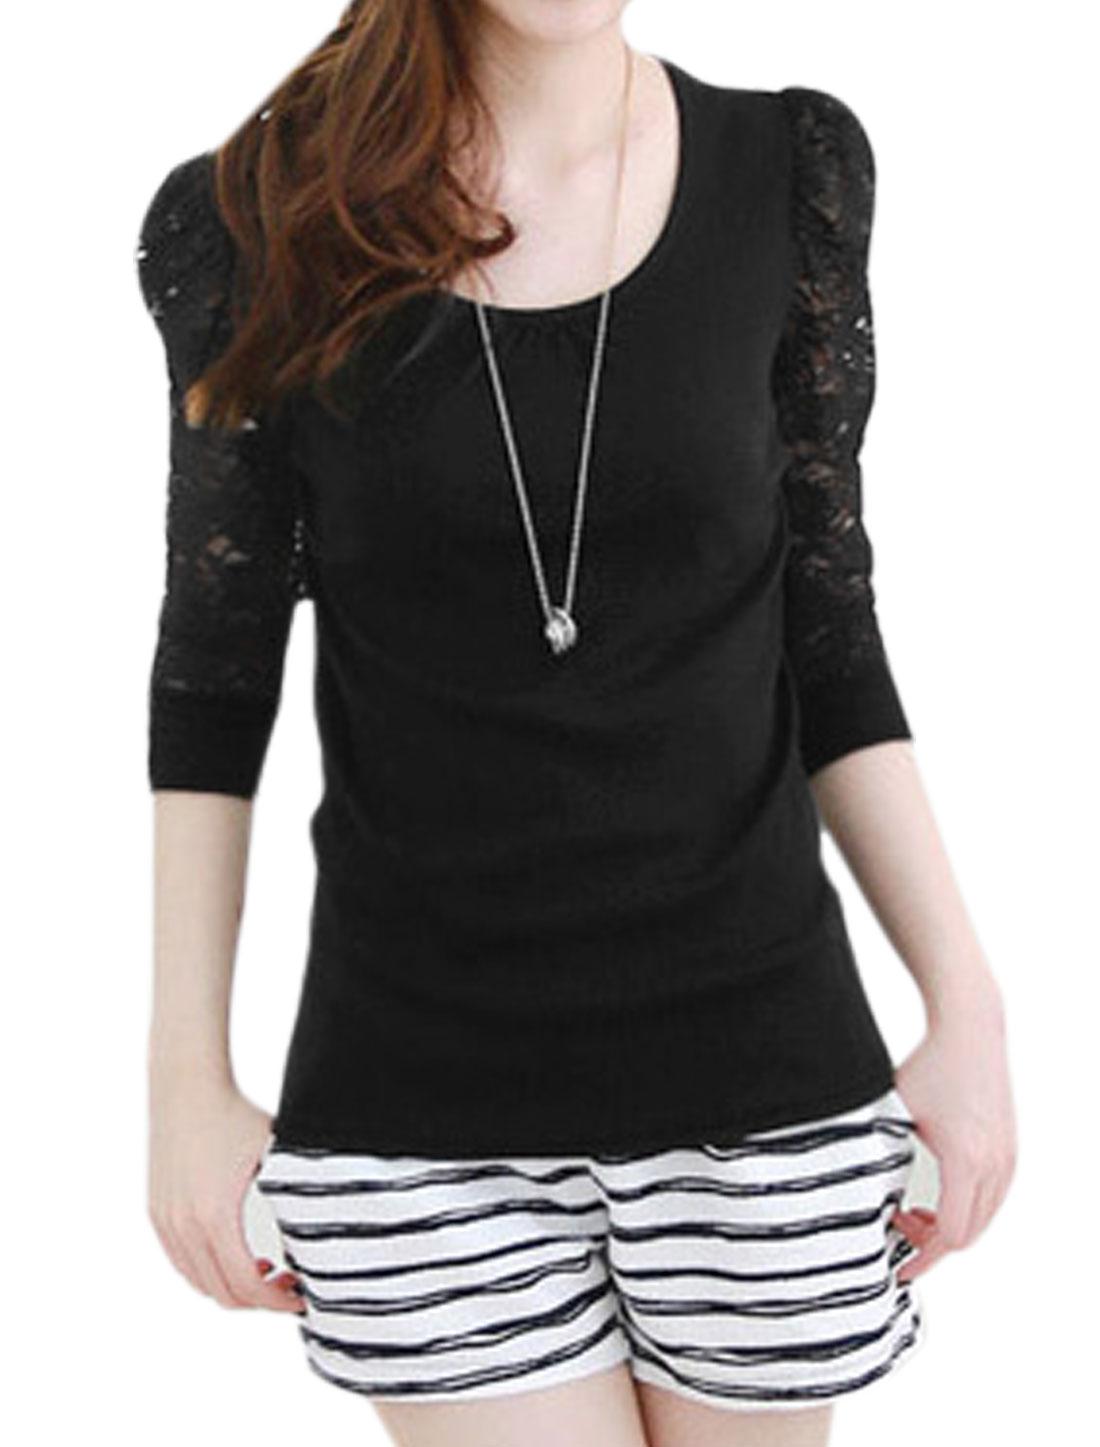 Ladies Slipover Semi Sheet Lace Sleeves Spiced Black Shirt S